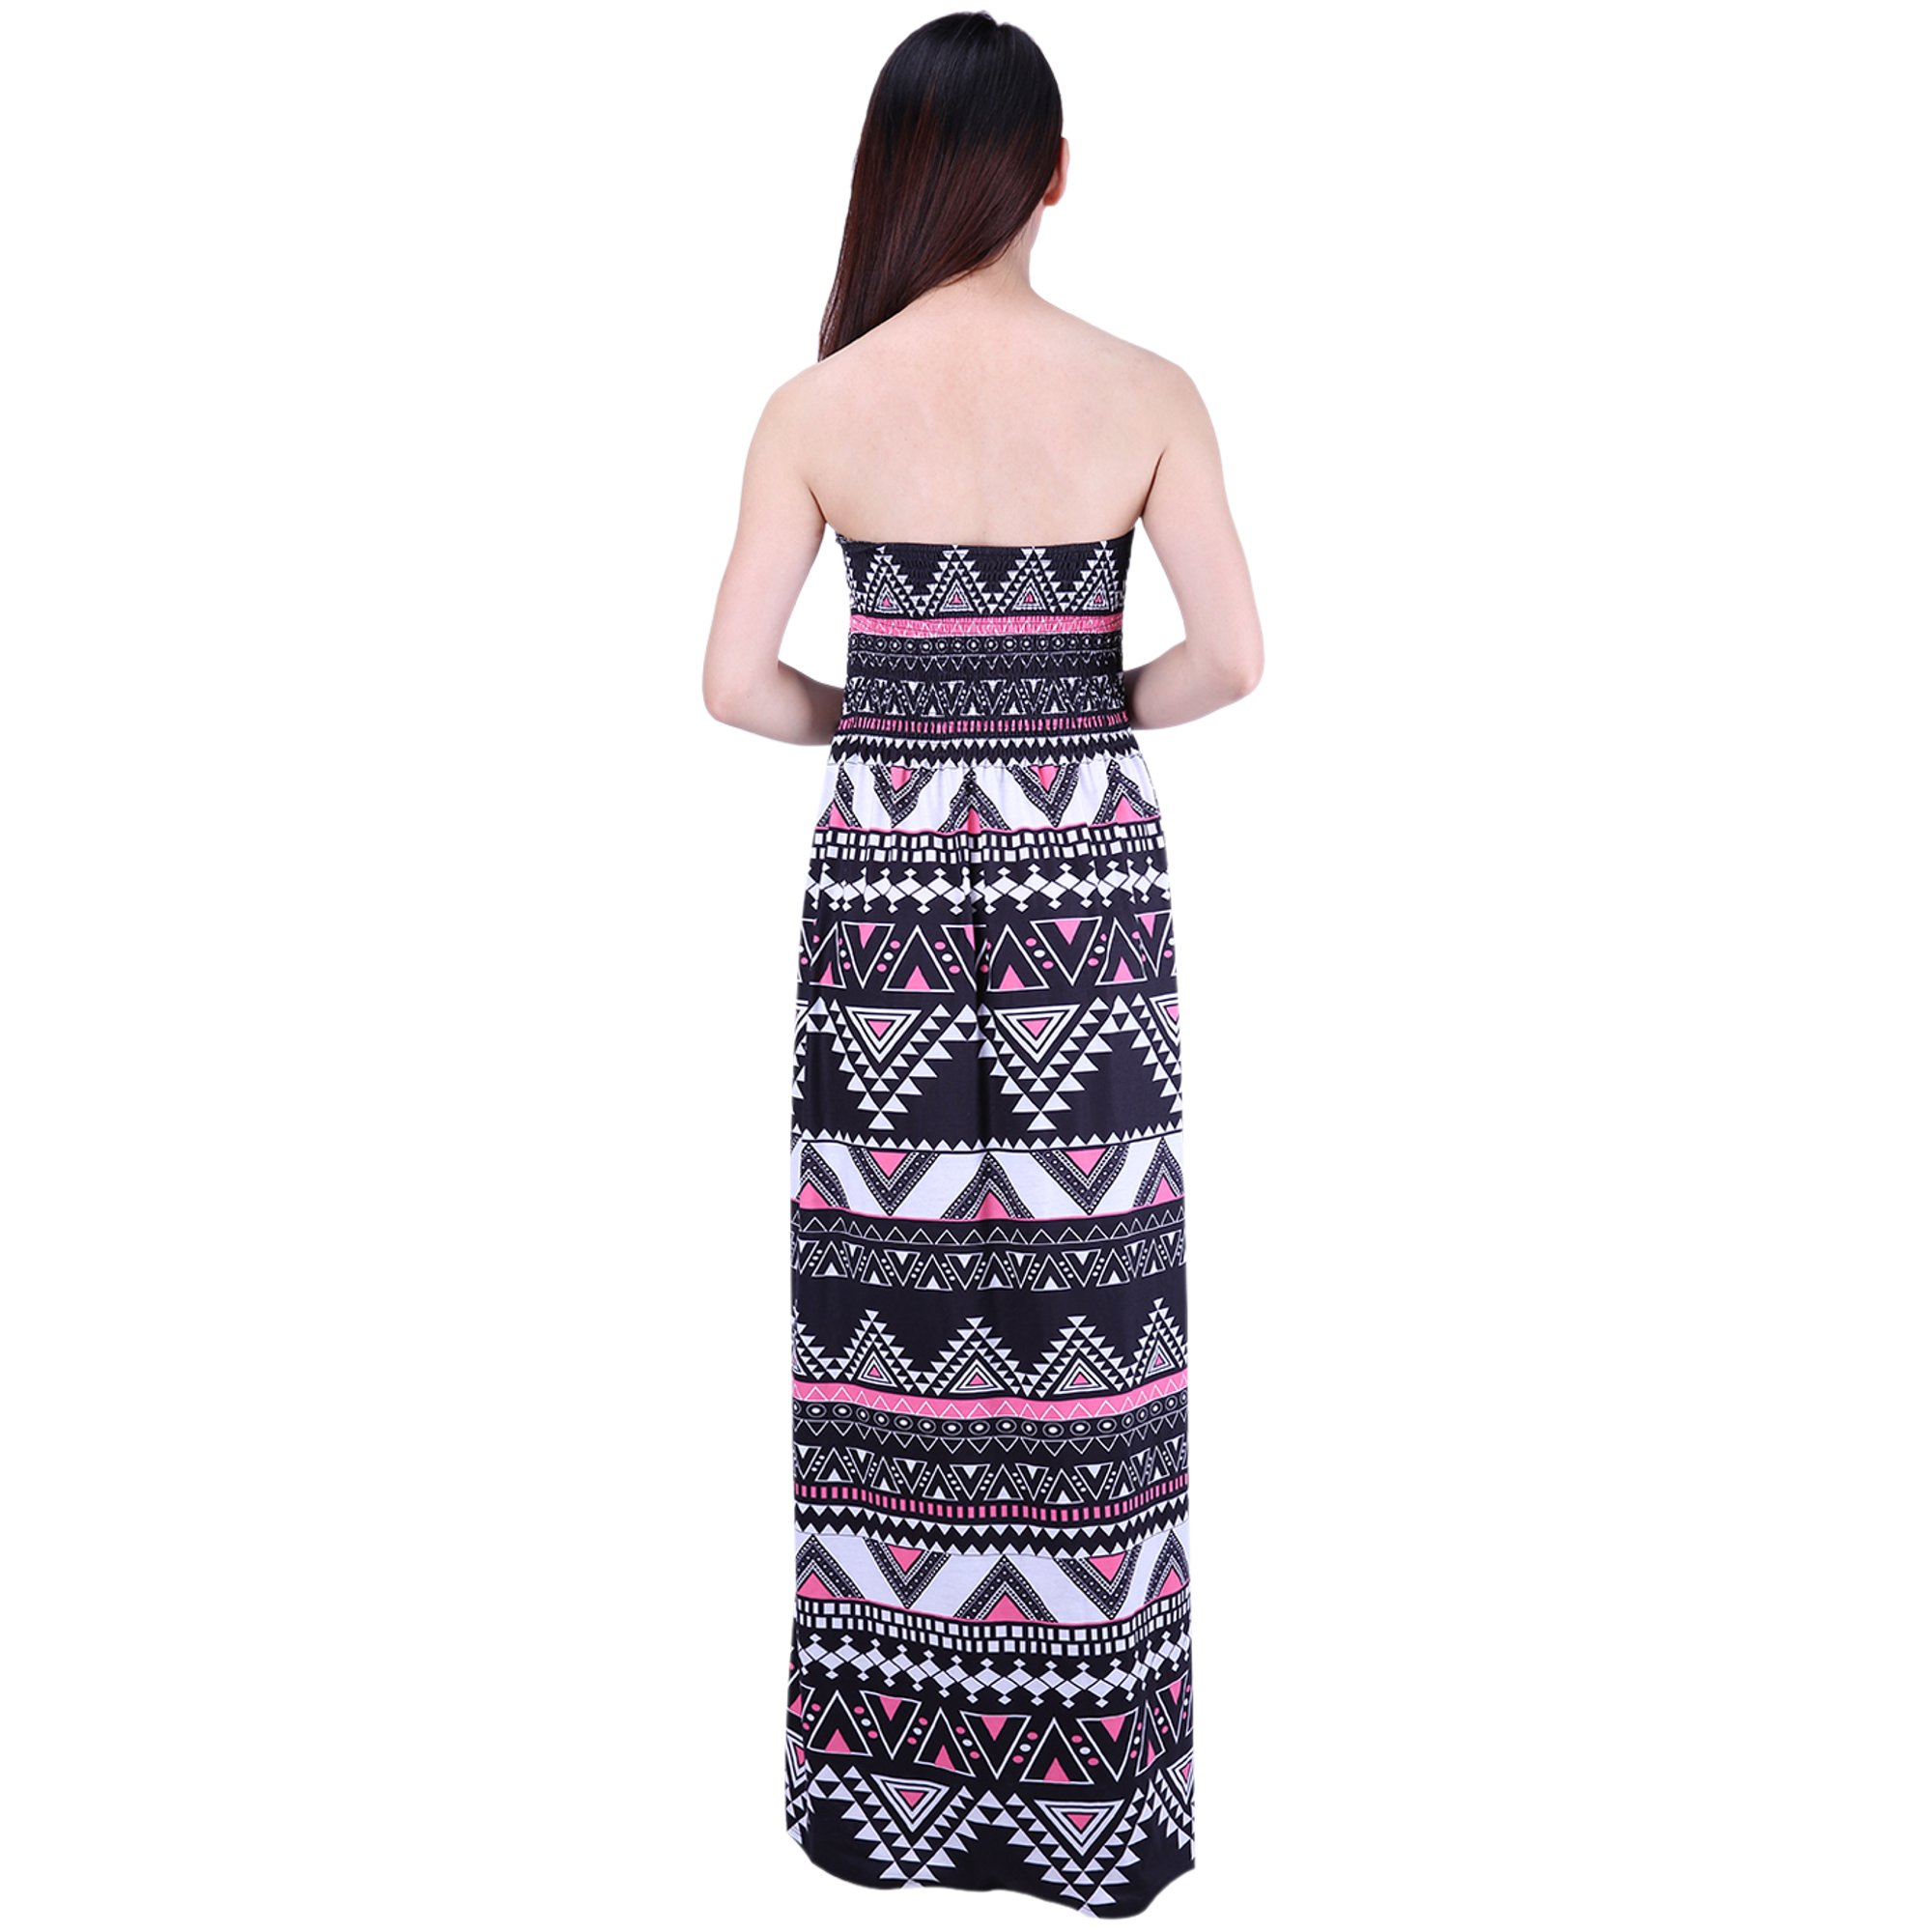 38c8adbf3361f HDE Women's Strapless Maxi Dress Tube Top Long Skirt Sundress Cover Up |  Walmart Canada